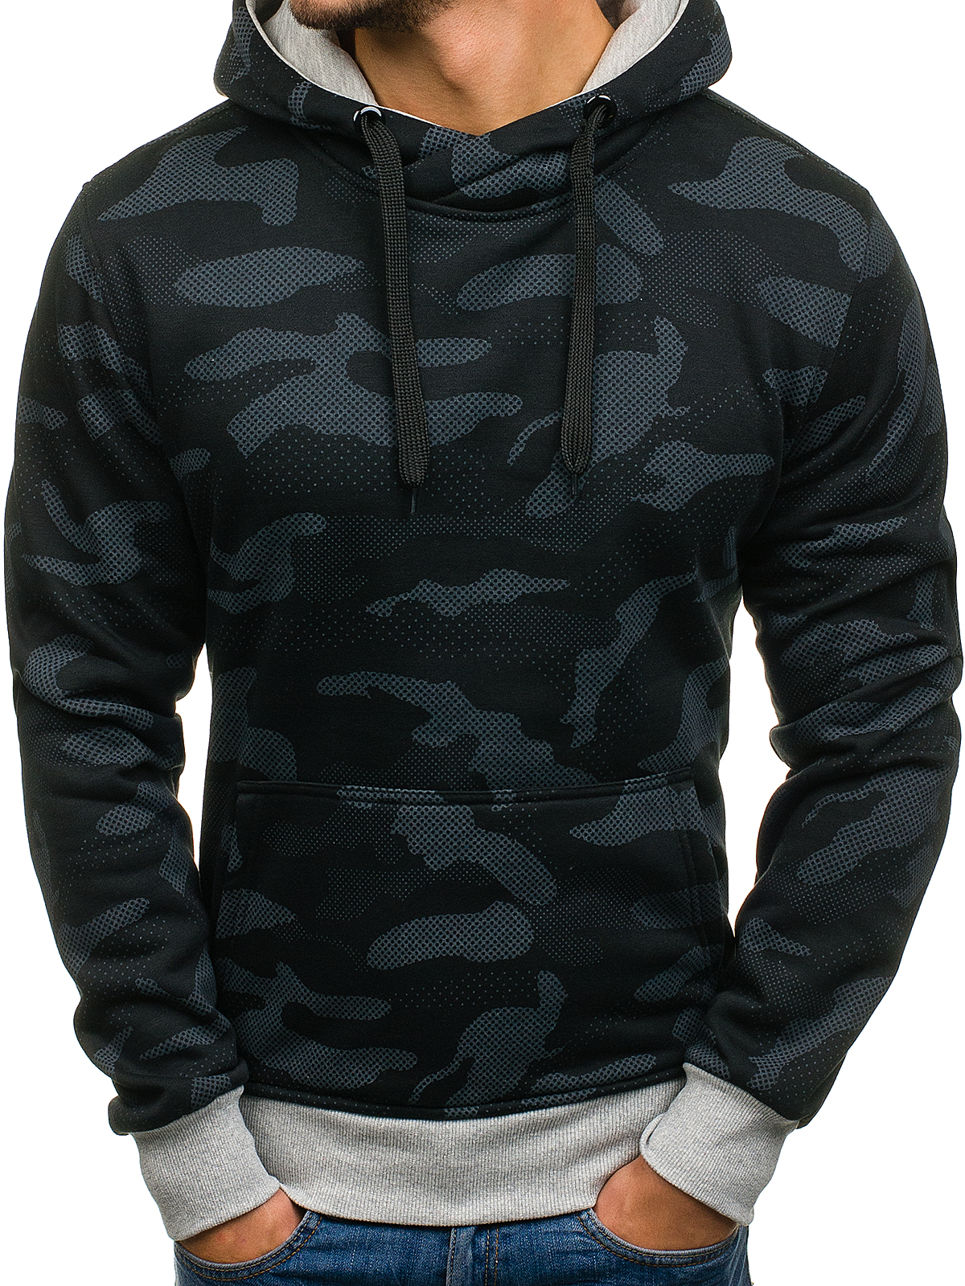 Mens Long Sleeve Camouflage Hoodie Zipper Sweatshirt Tops Jacket Coat Outwear